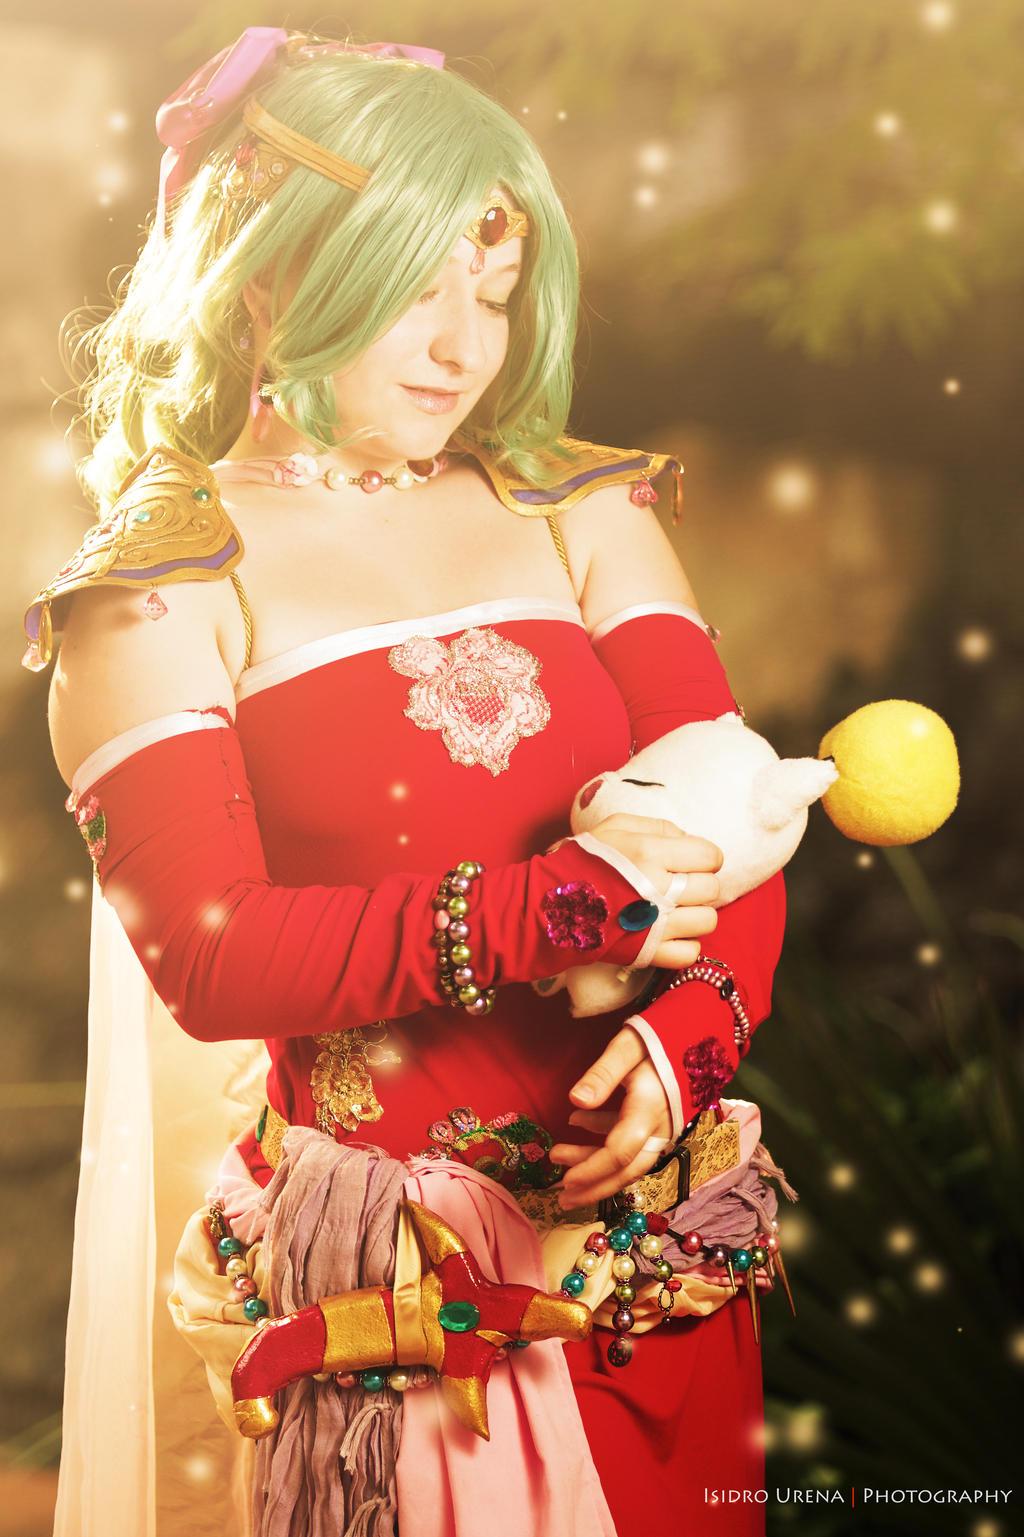 Terra Branford by YachiruFoxTailFairy